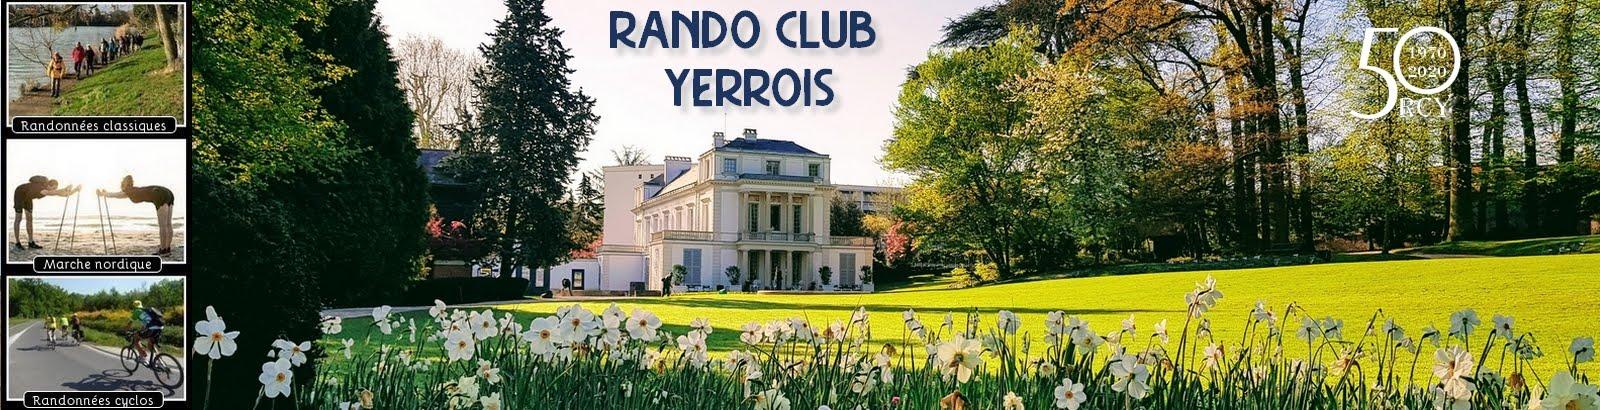 Rando club Yerrois - RCY